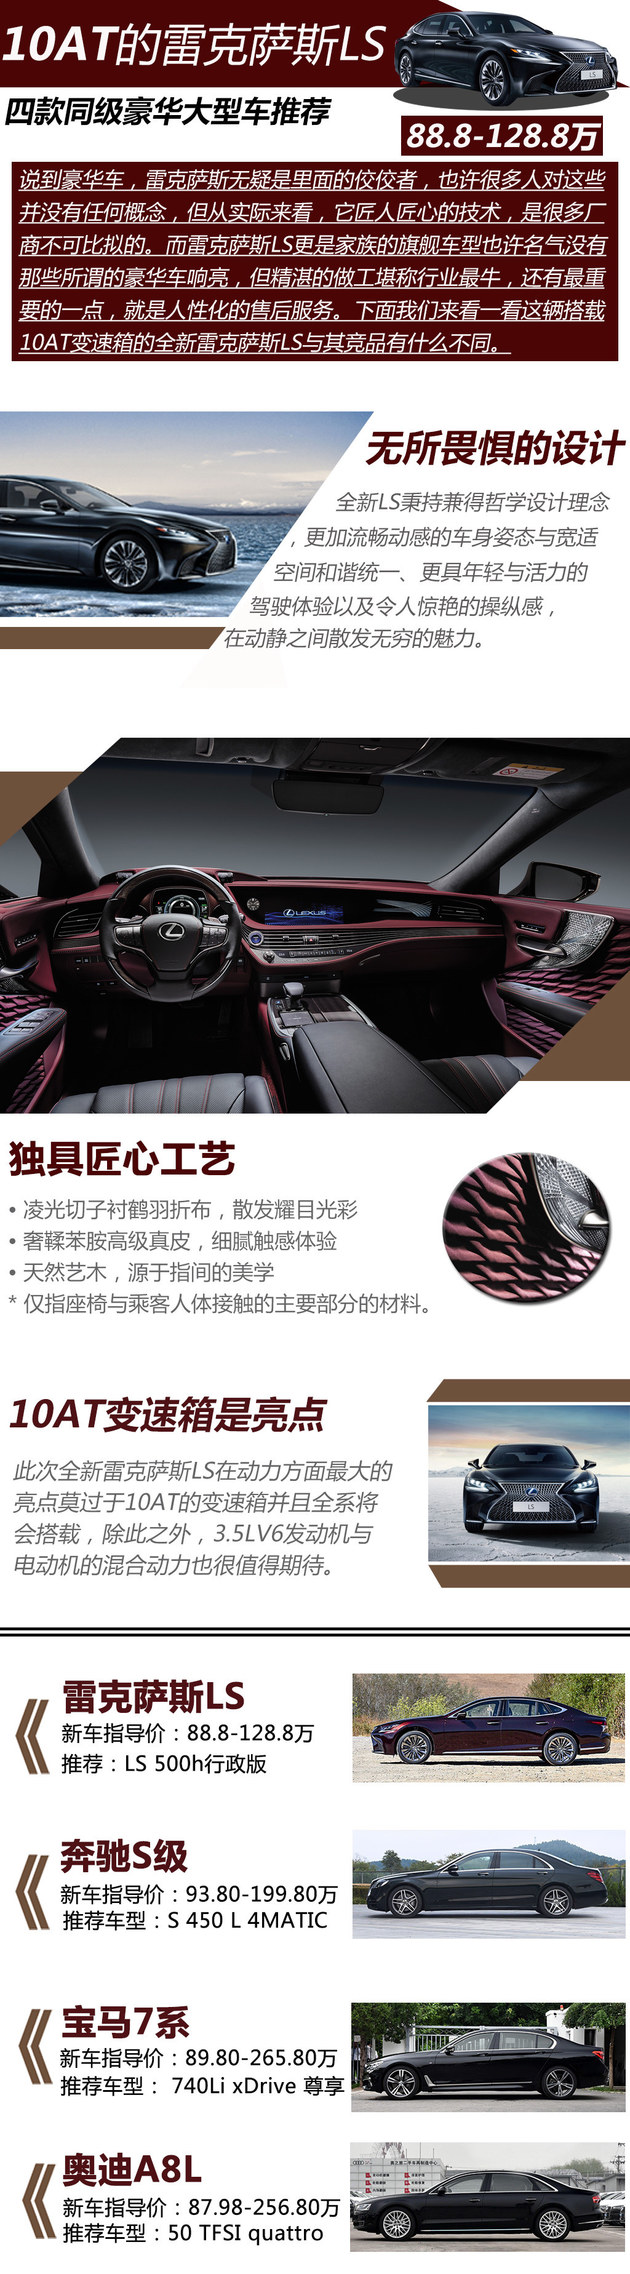 10AT的雷克萨斯LS 四款豪华大型车推荐